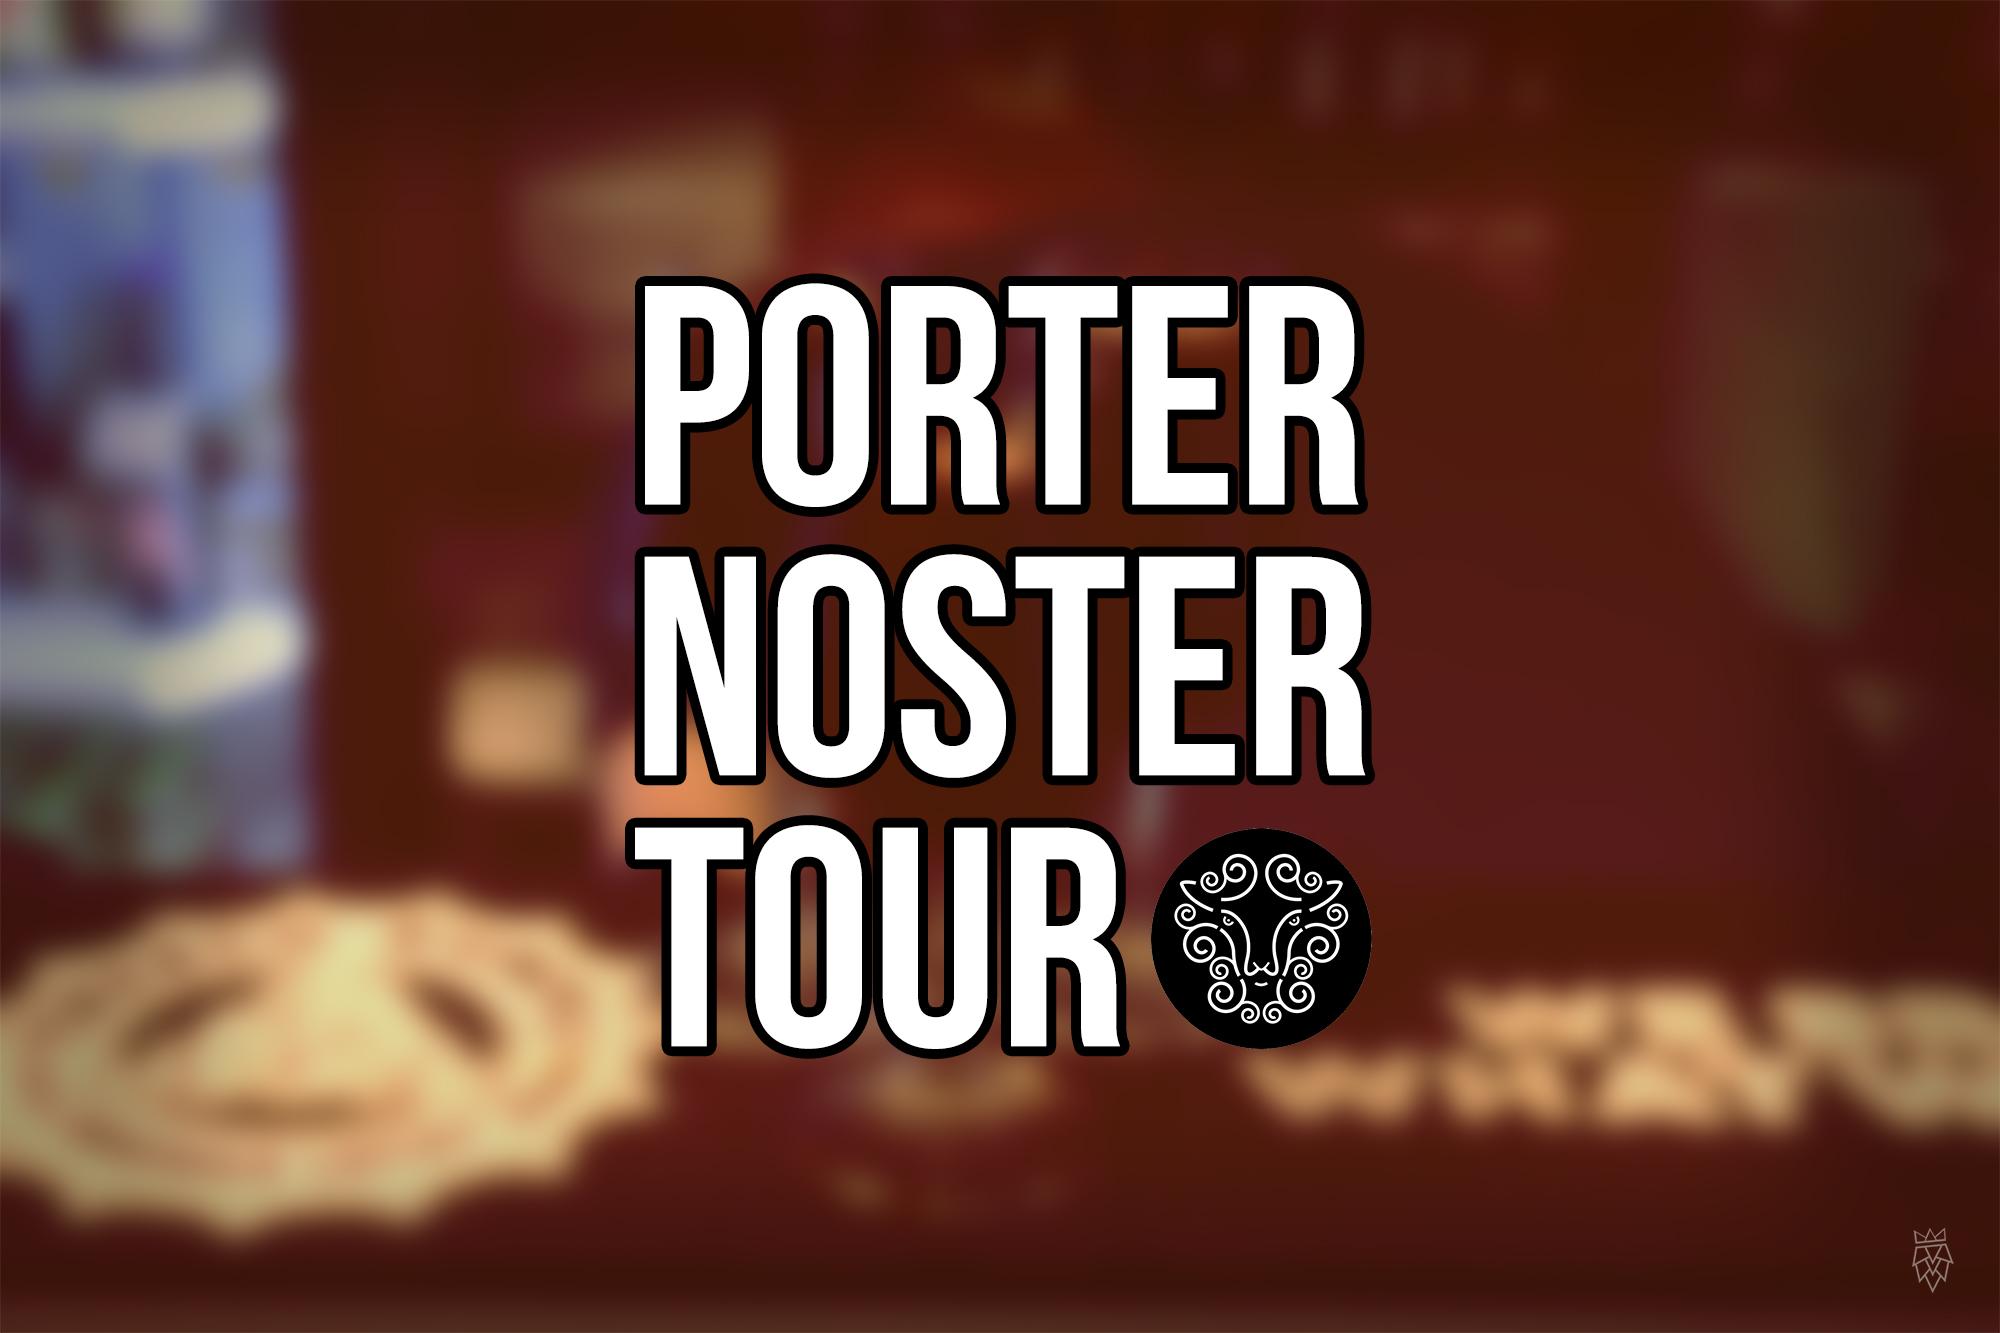 Porter Noster Tour 2018